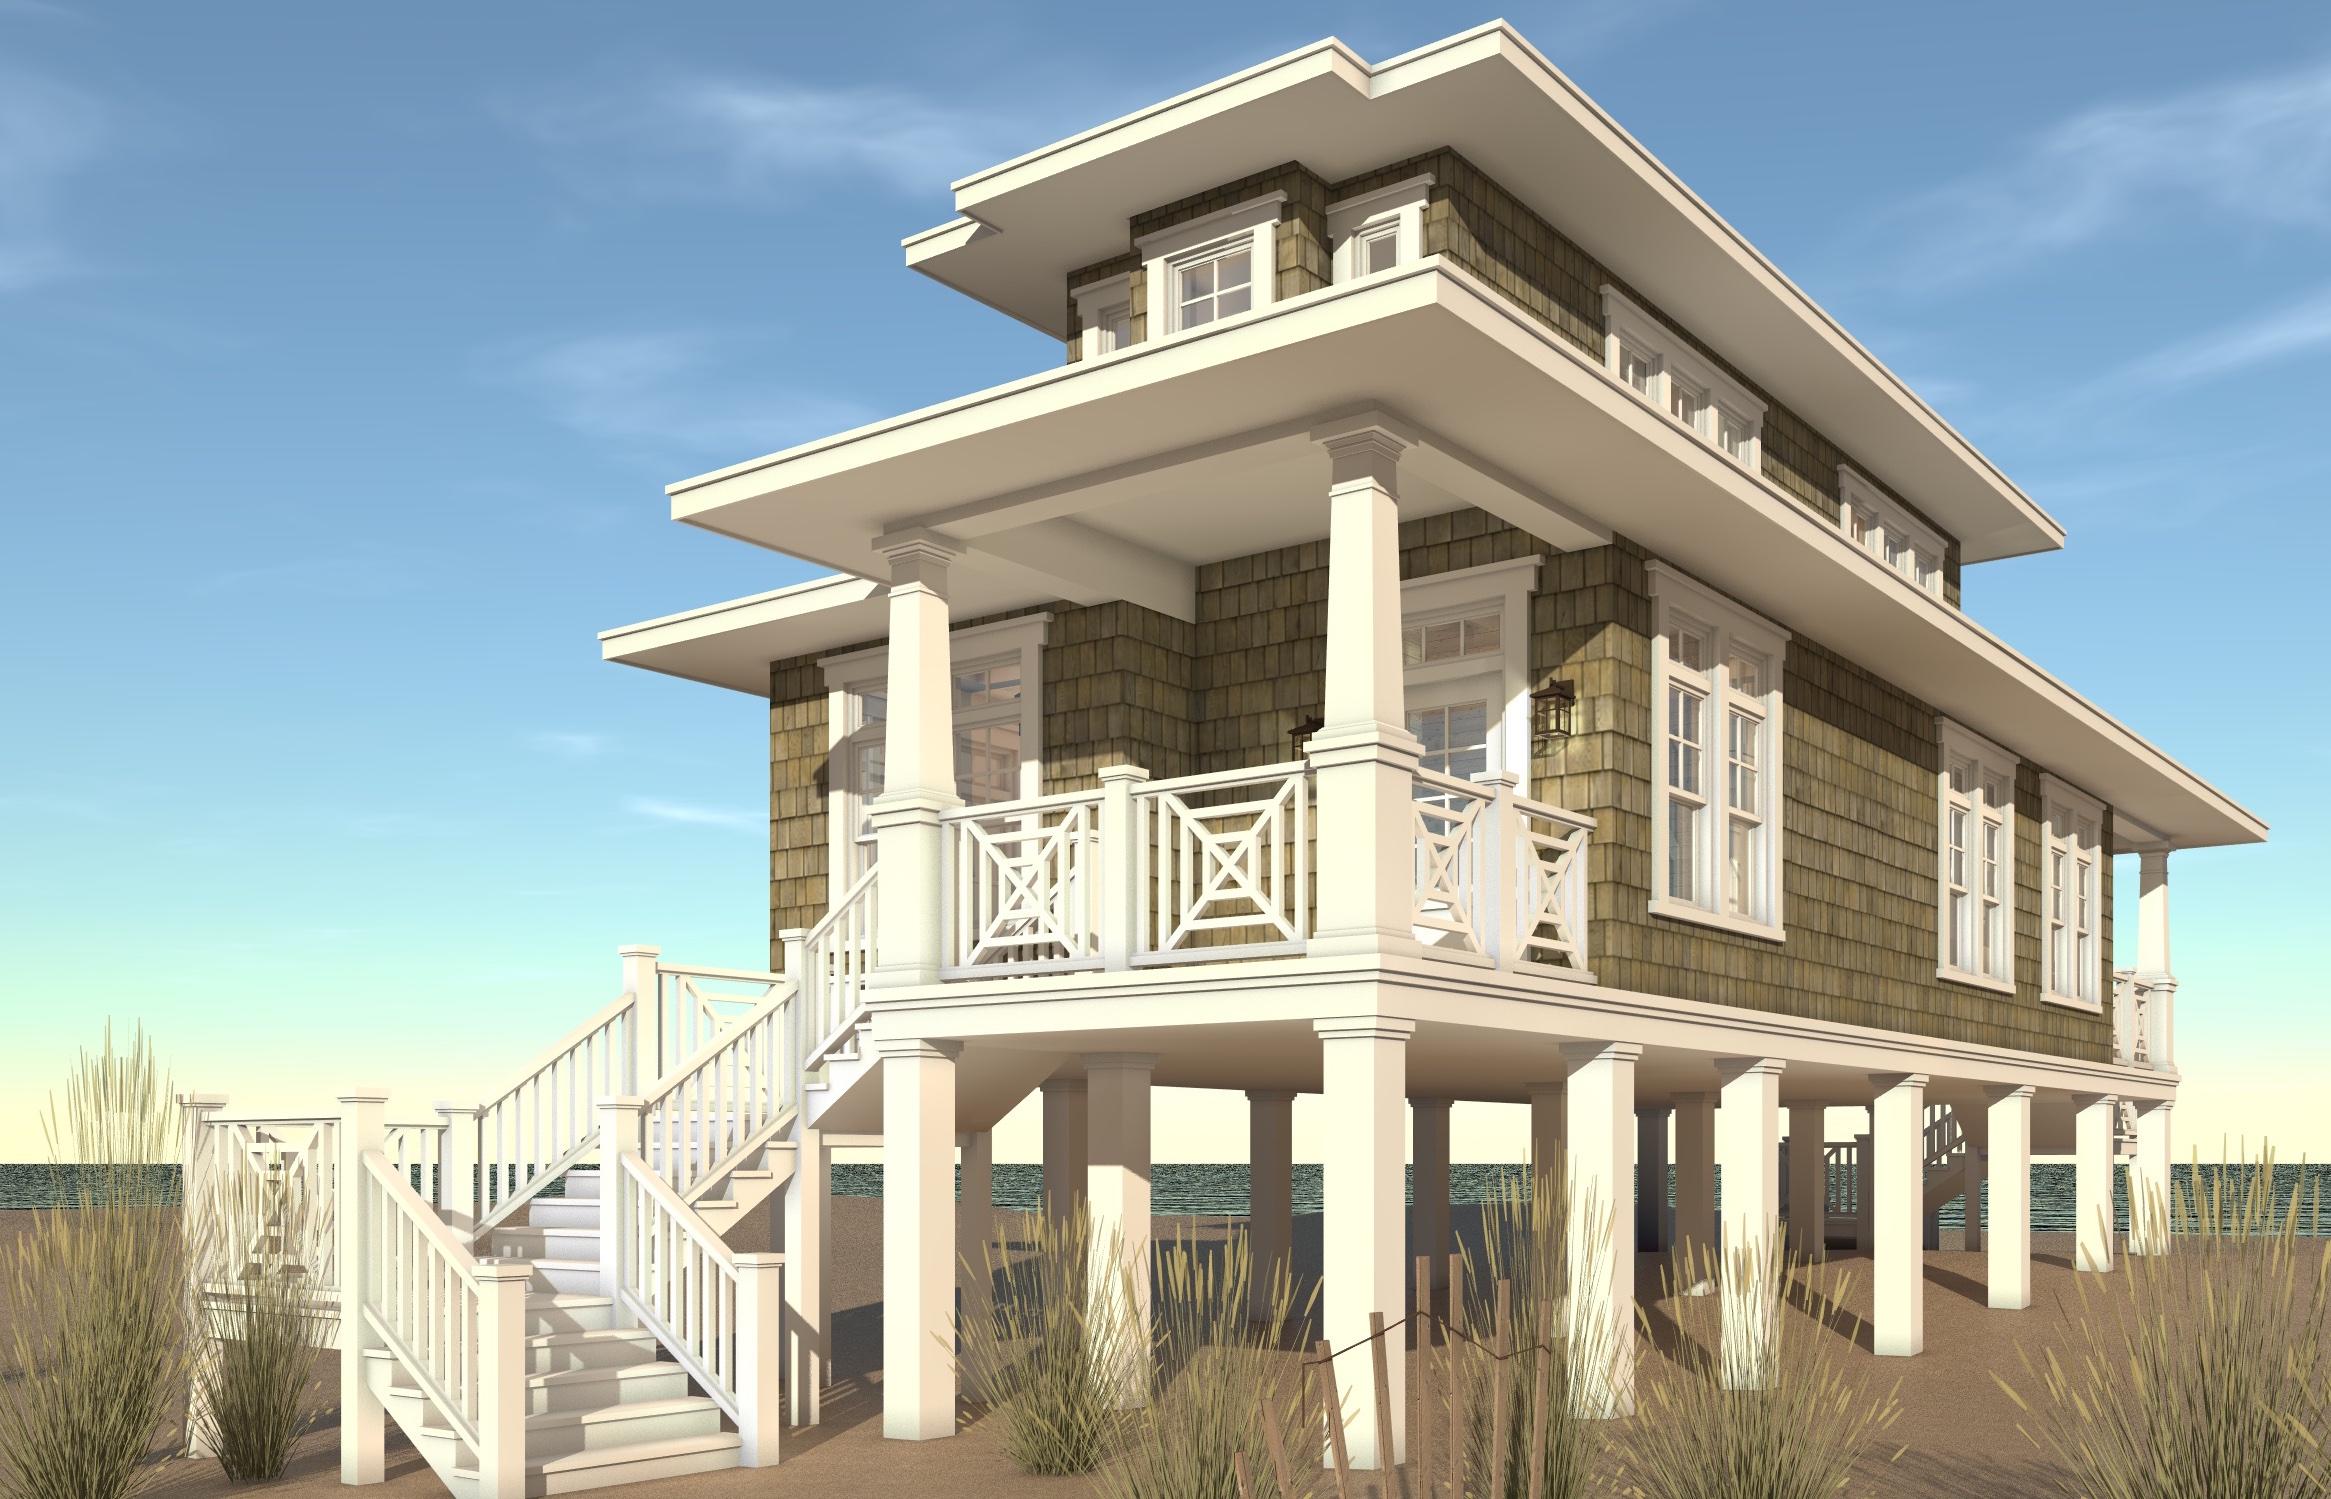 Beachfront House Plan  2 Bedrms 2 Baths  1283 Sq Ft  1161089